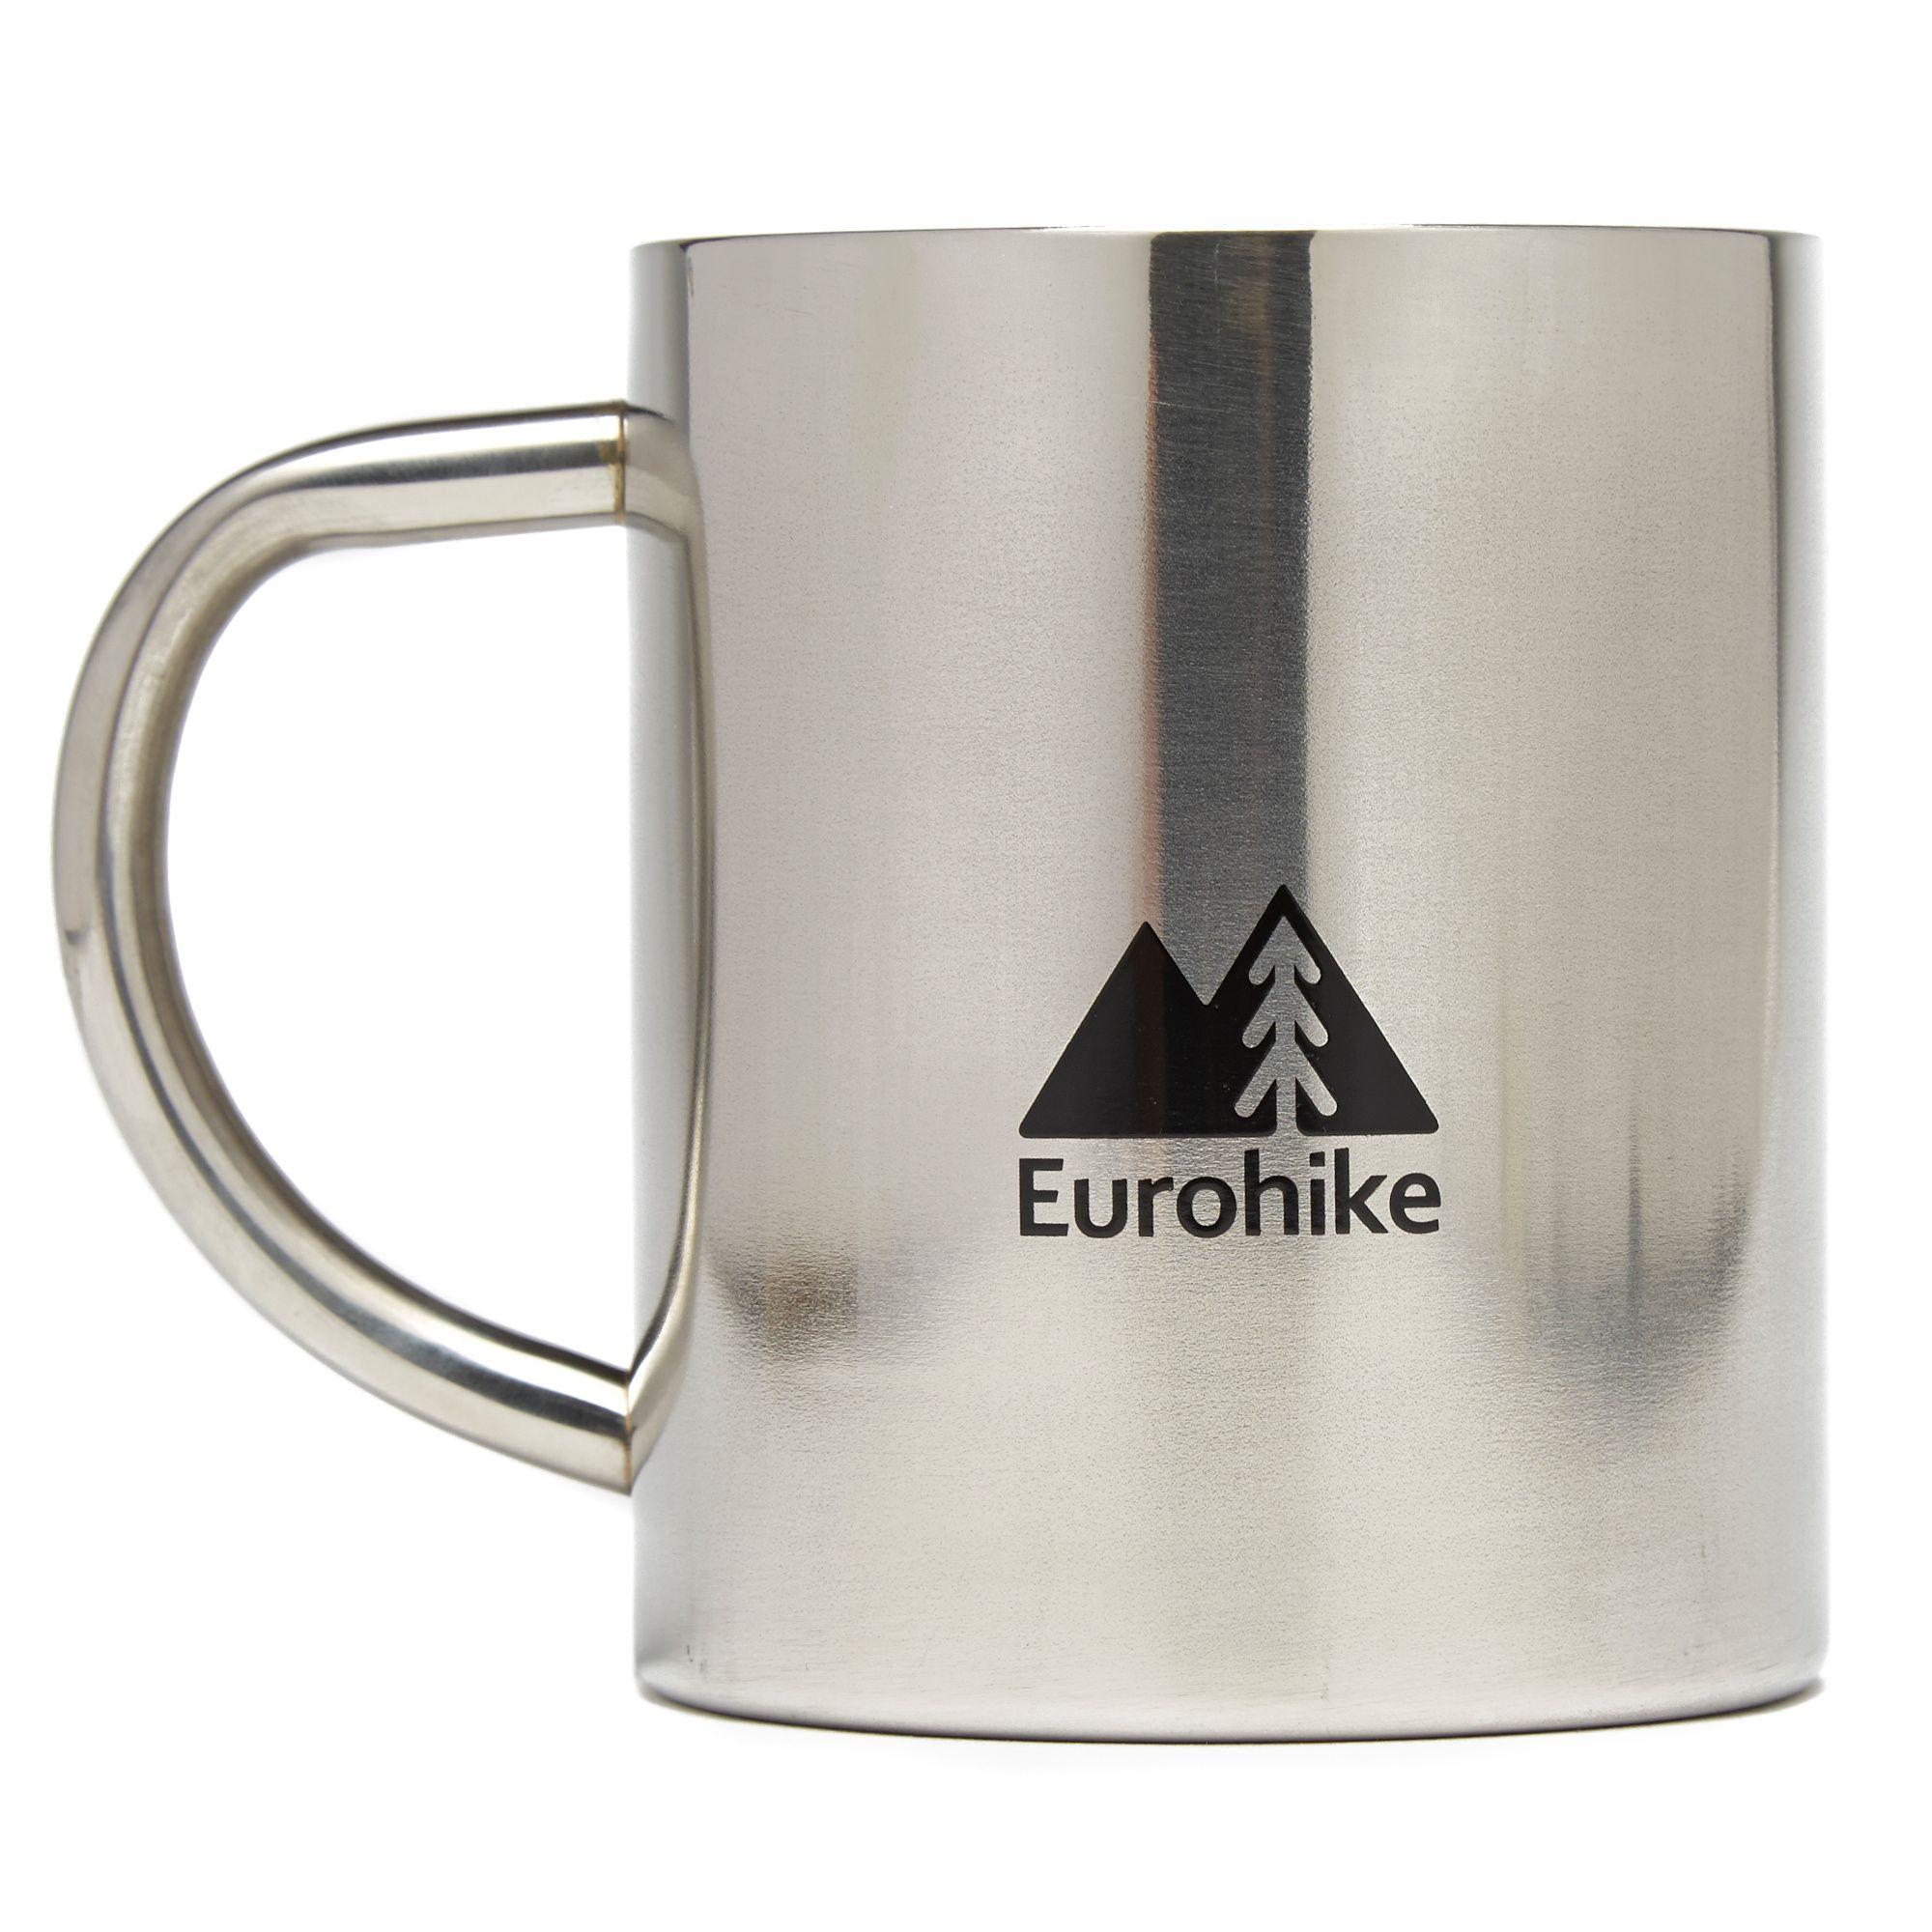 EUROHIKE Stainless Steel Brew Mug